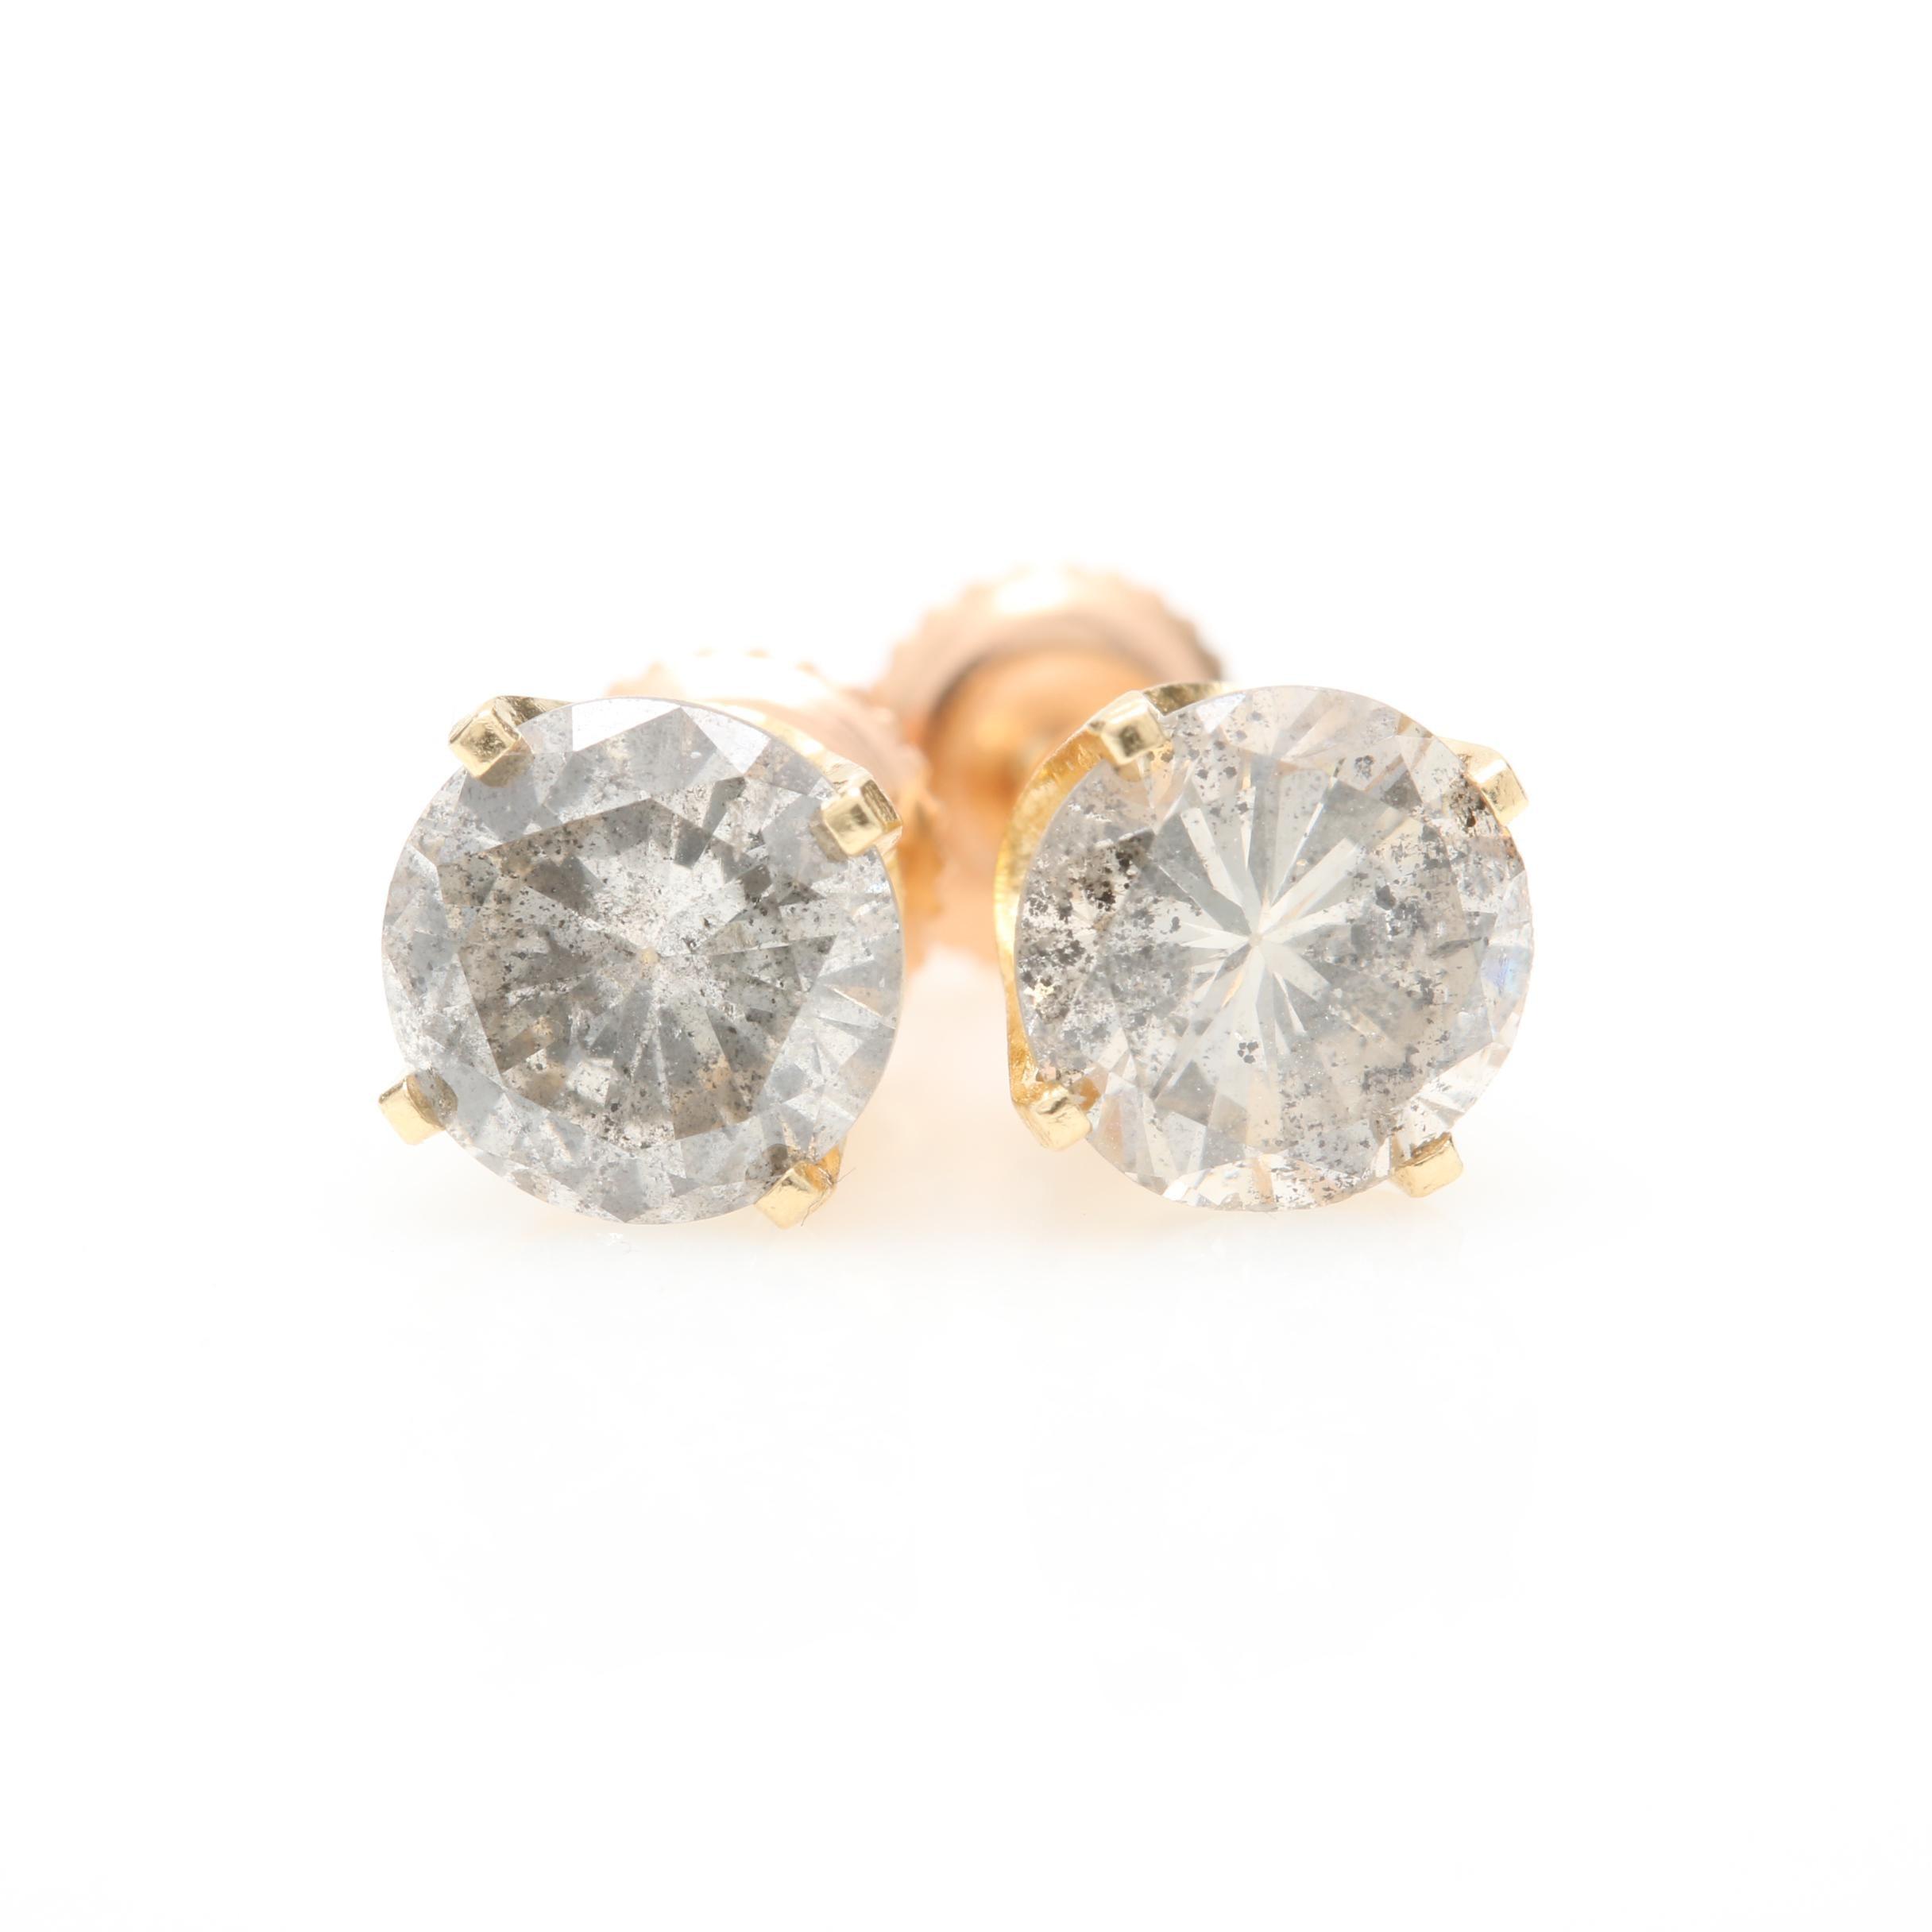 14K Yellow Gold 1.10 CTW Diamond Stud Earrings